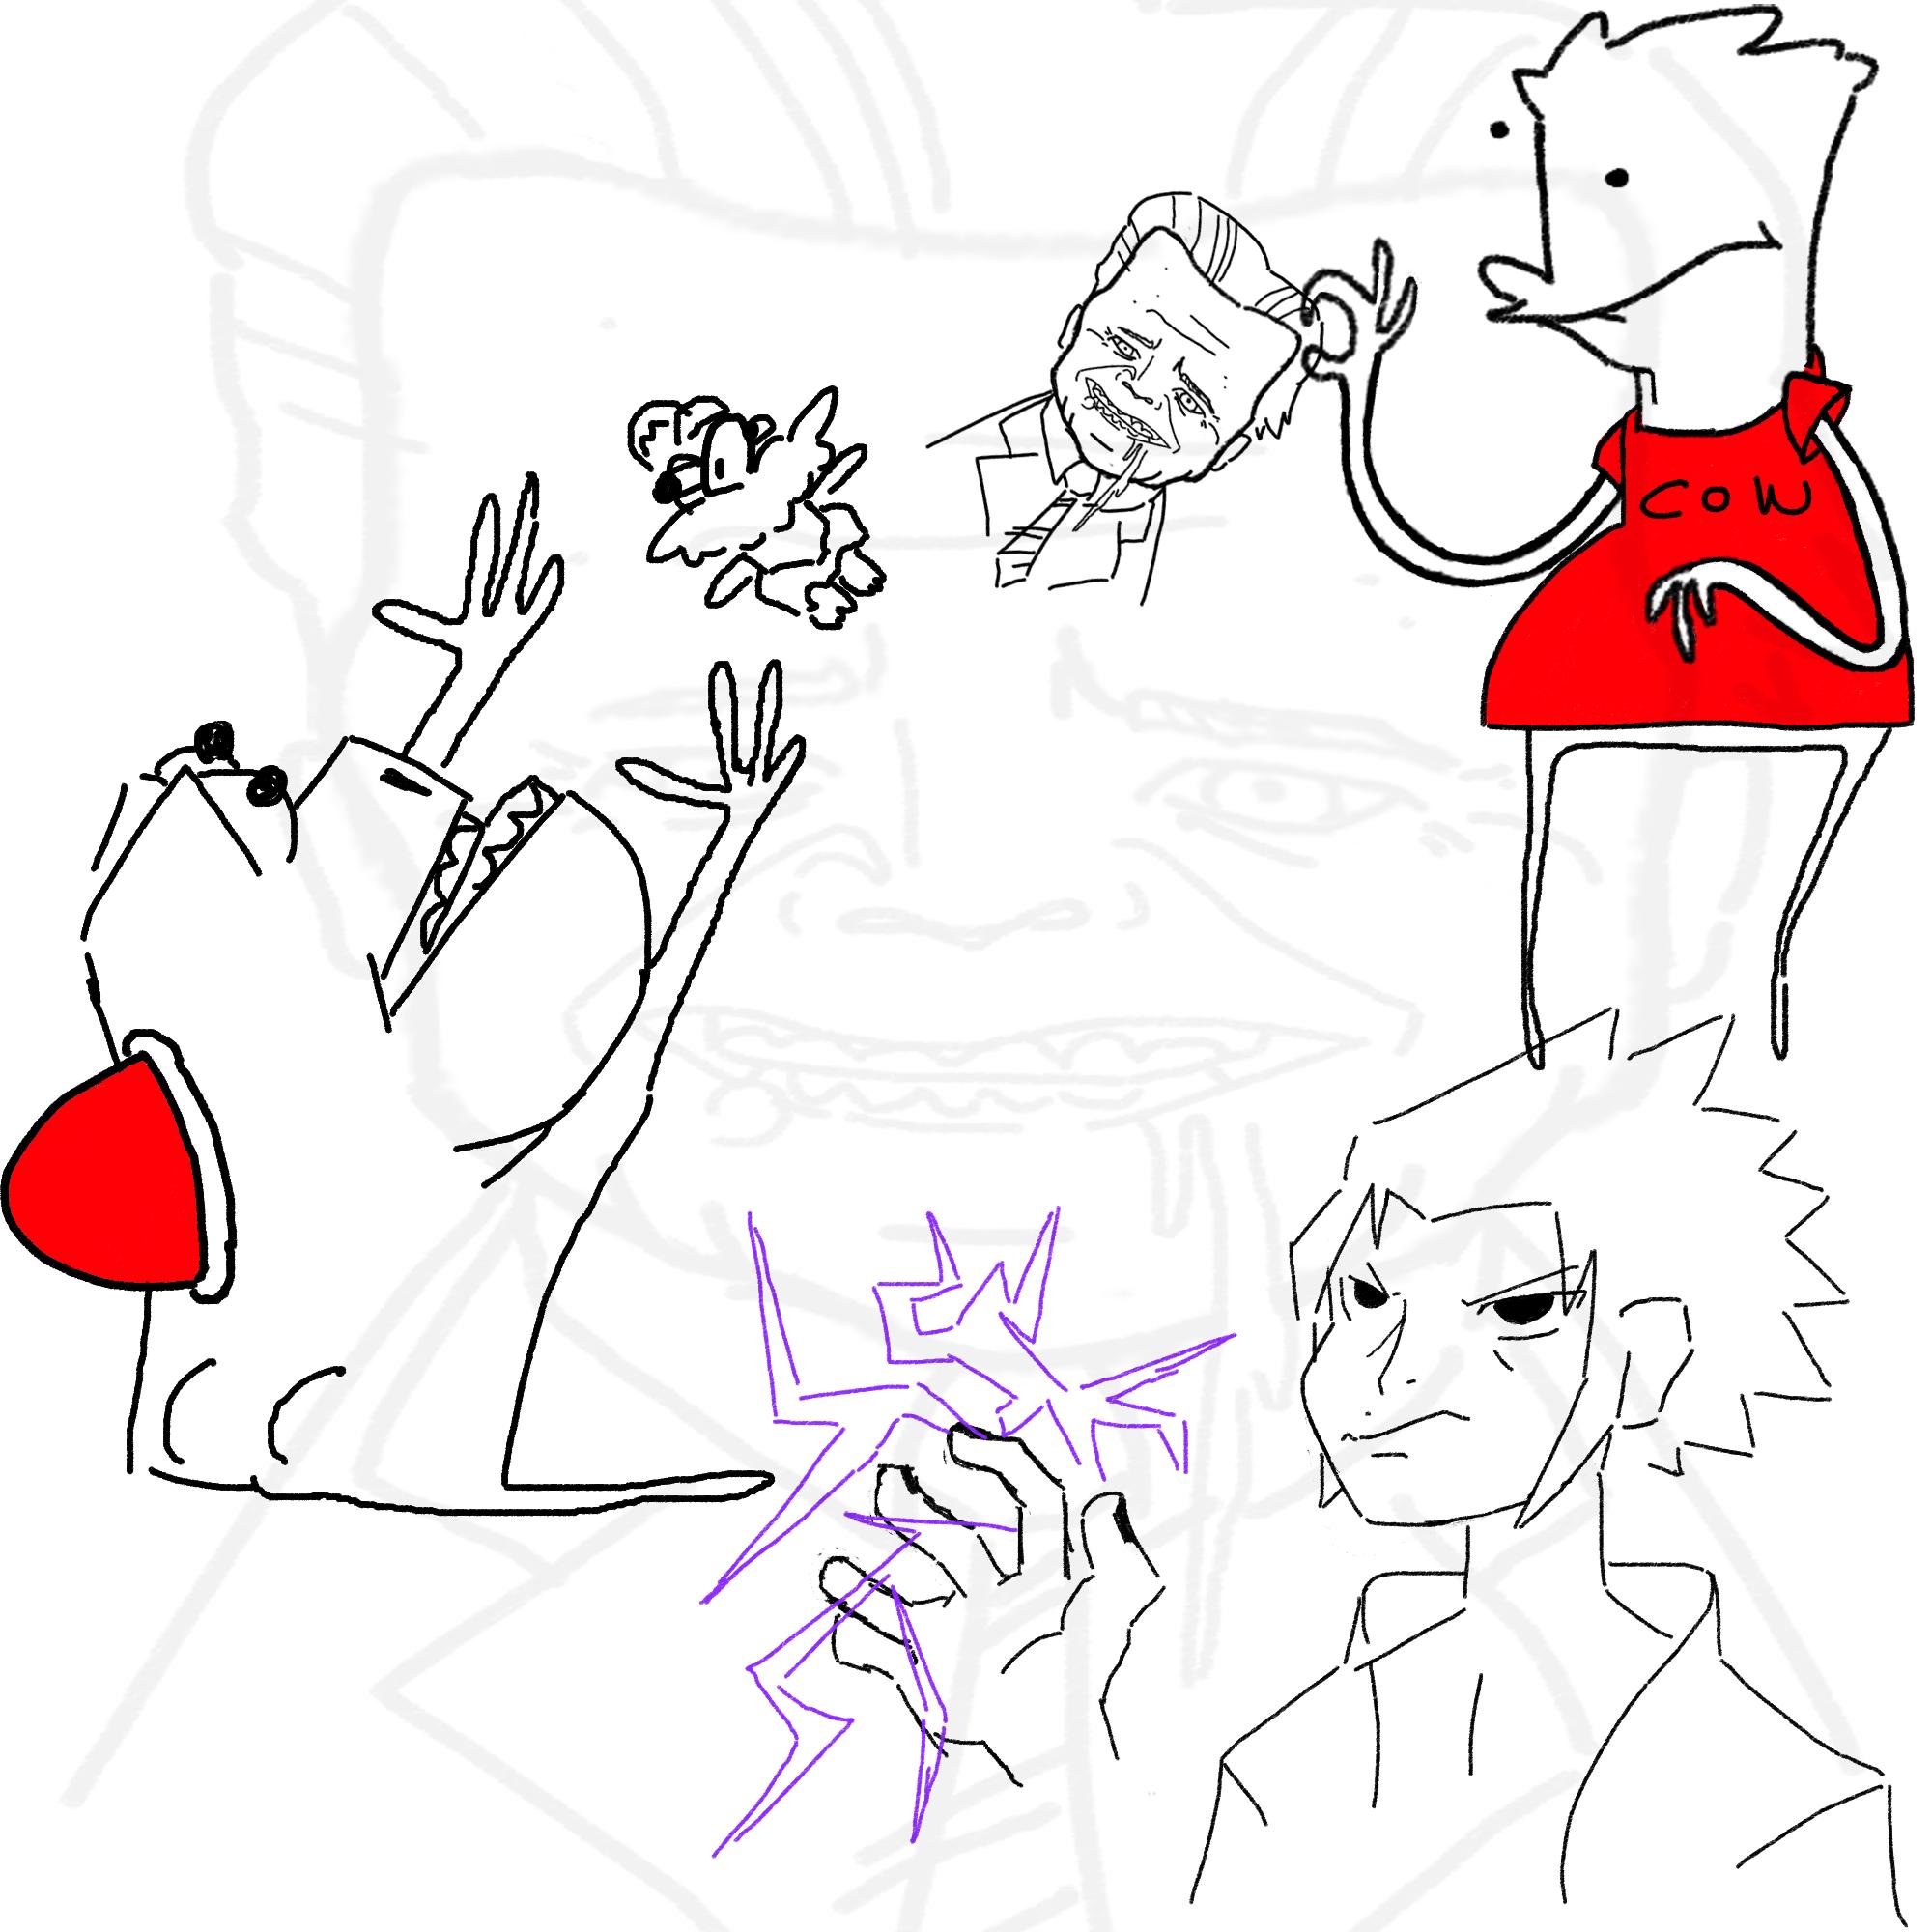 Bart and yoshi trade